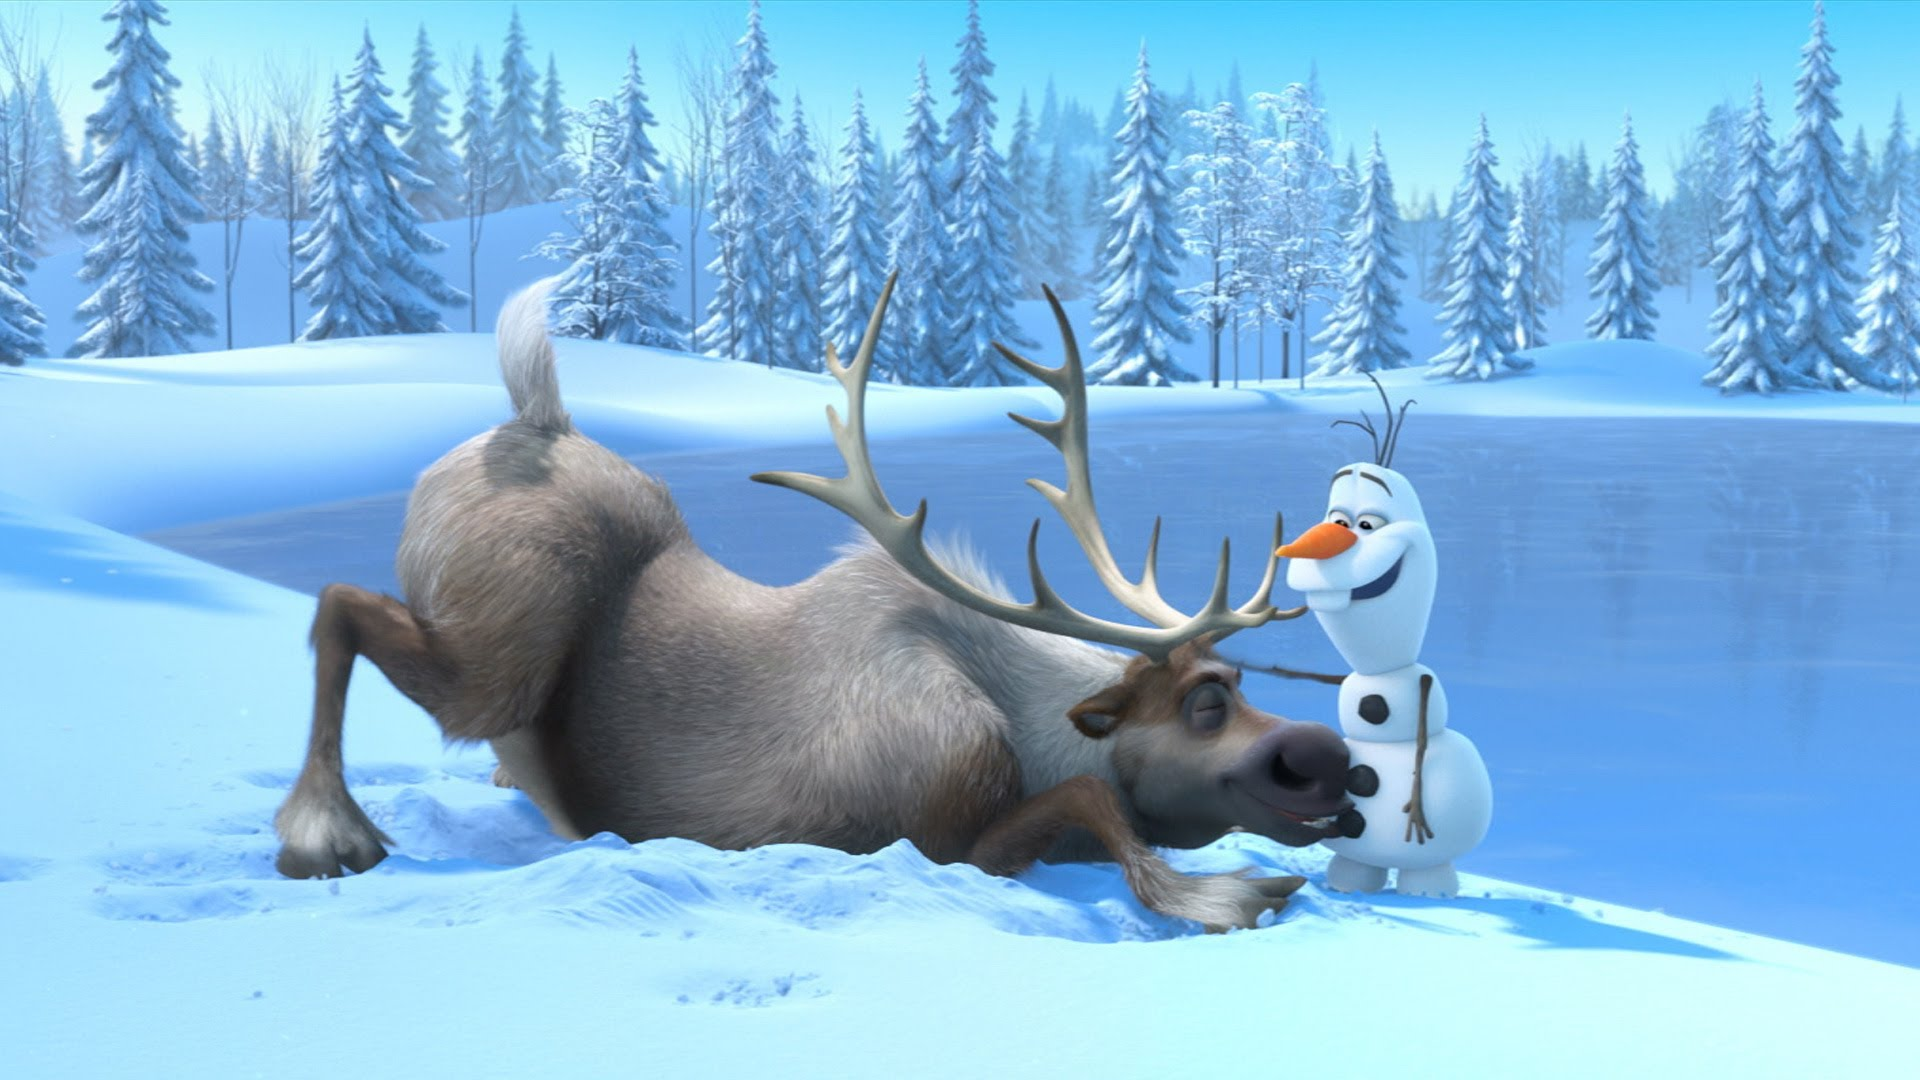 Jogos Frozen 2014 Jogos do Frozen 1920x1080